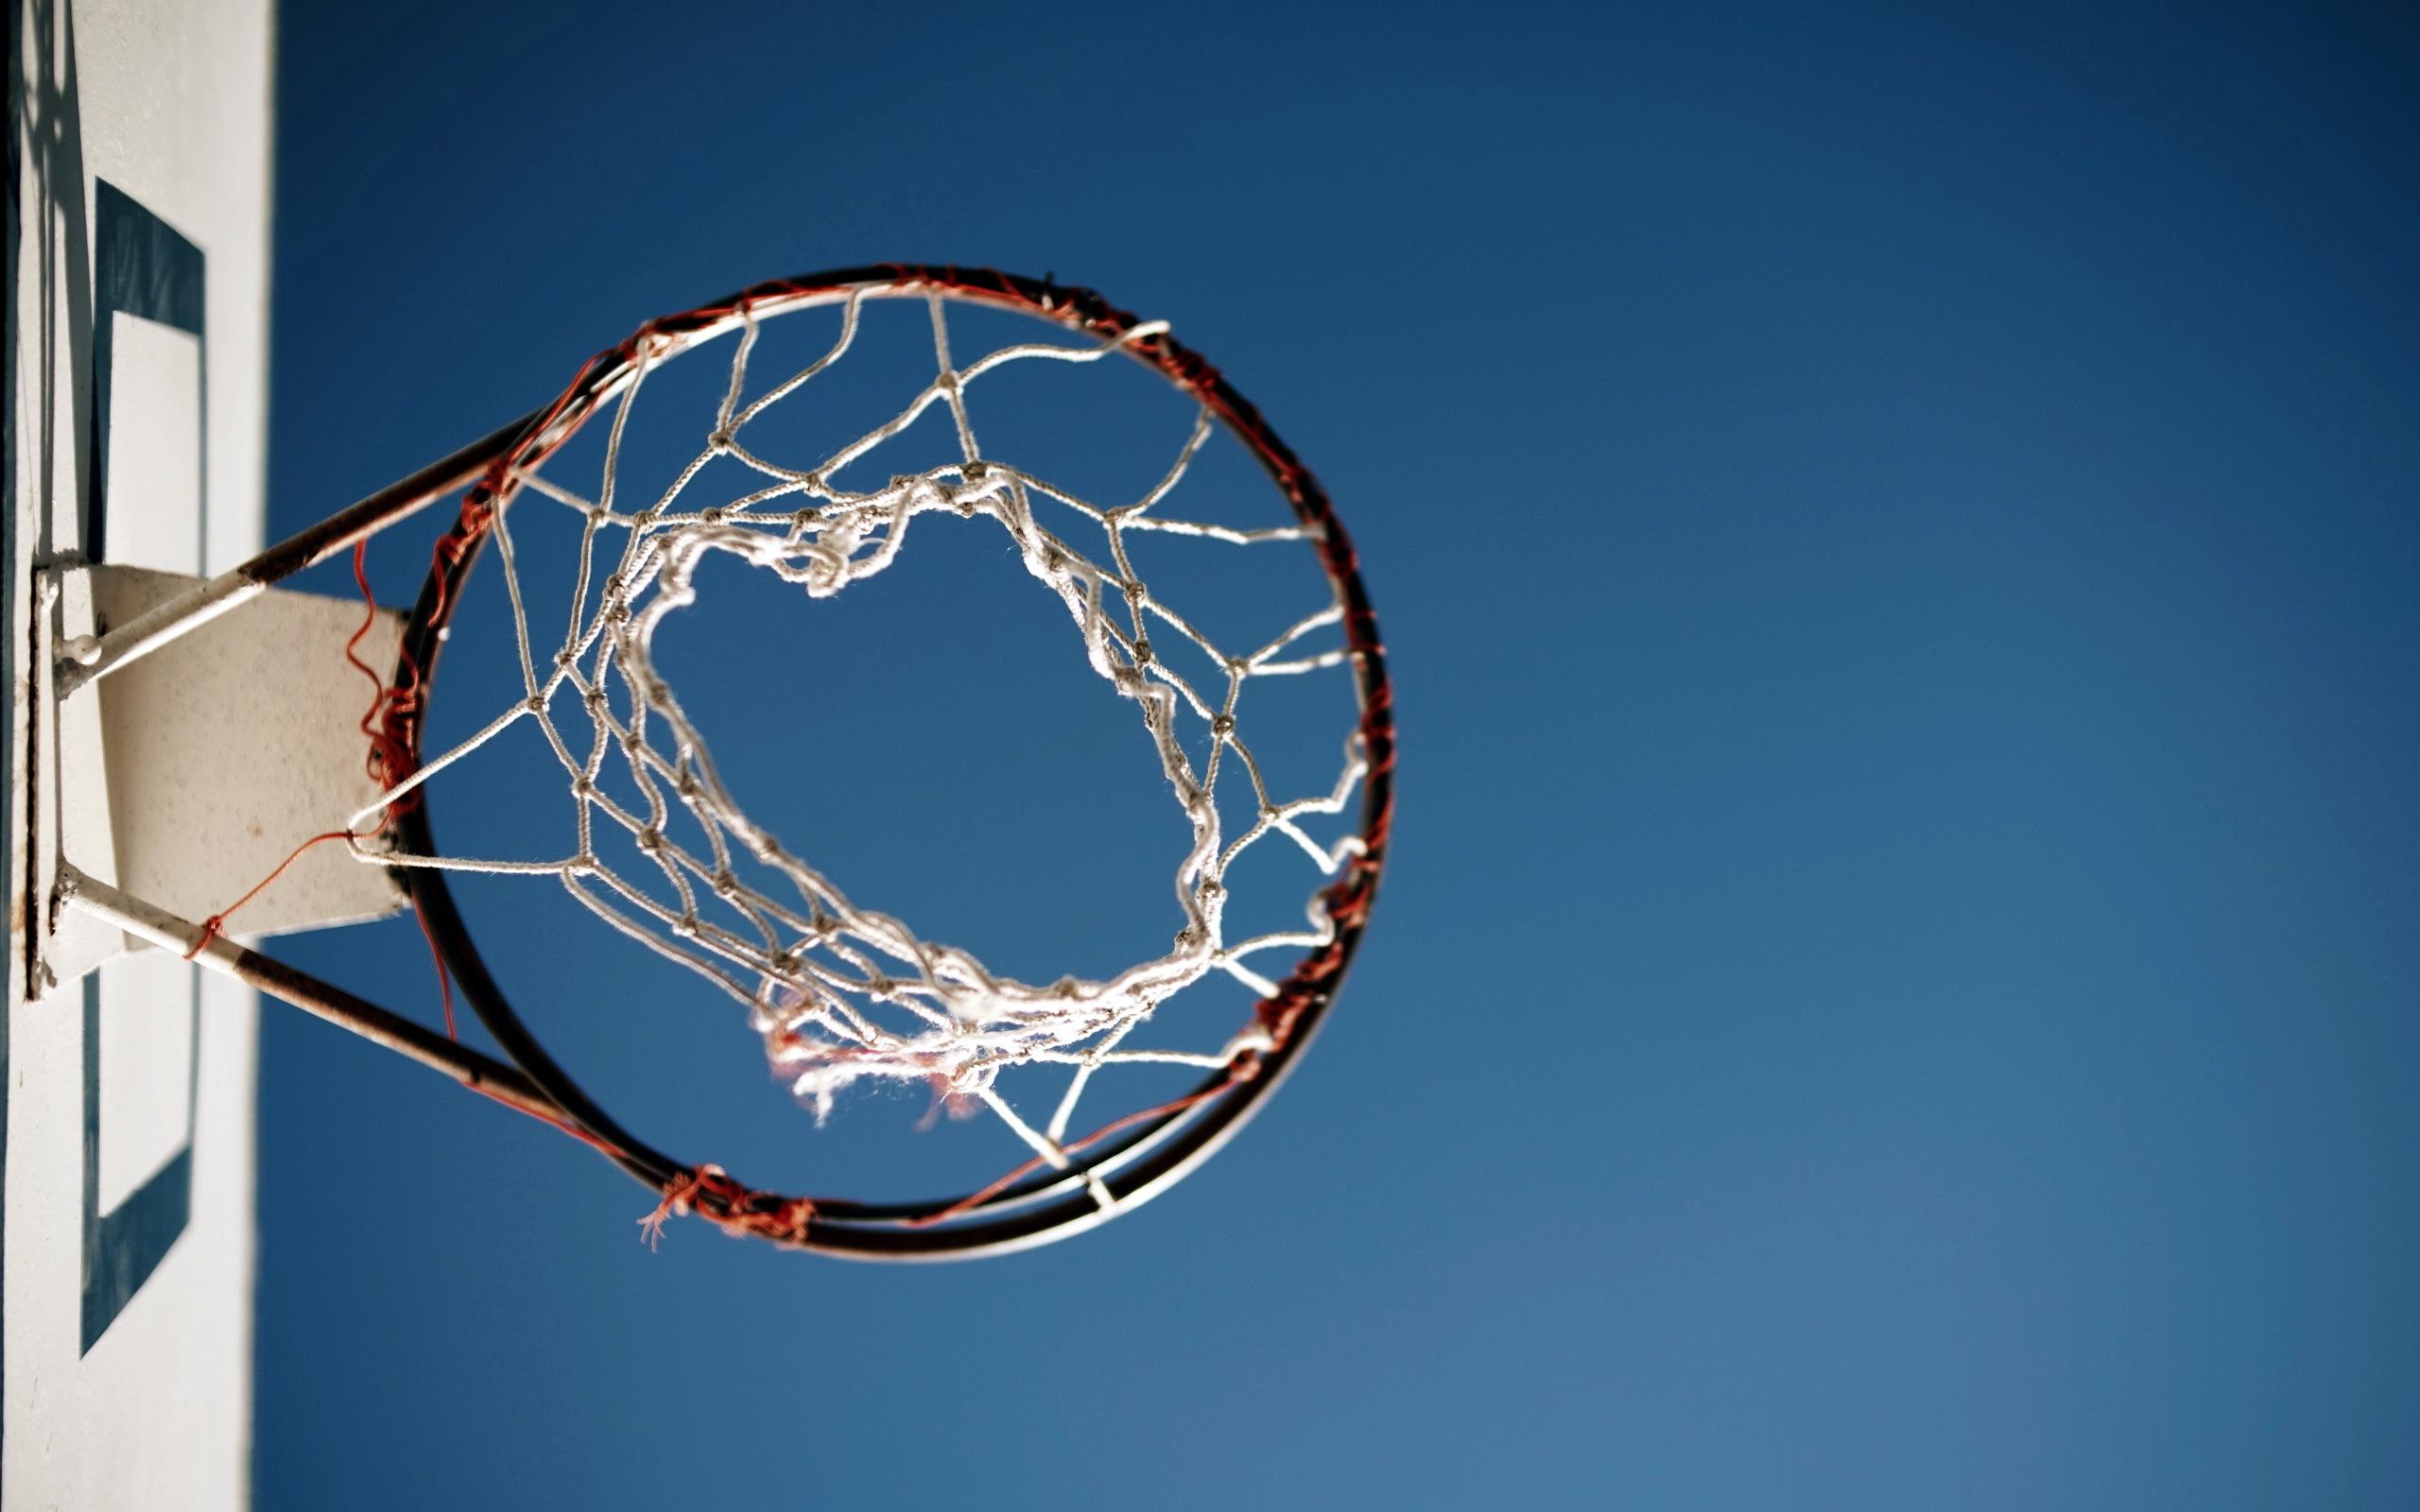 HD Wallpapers Basketball Ring